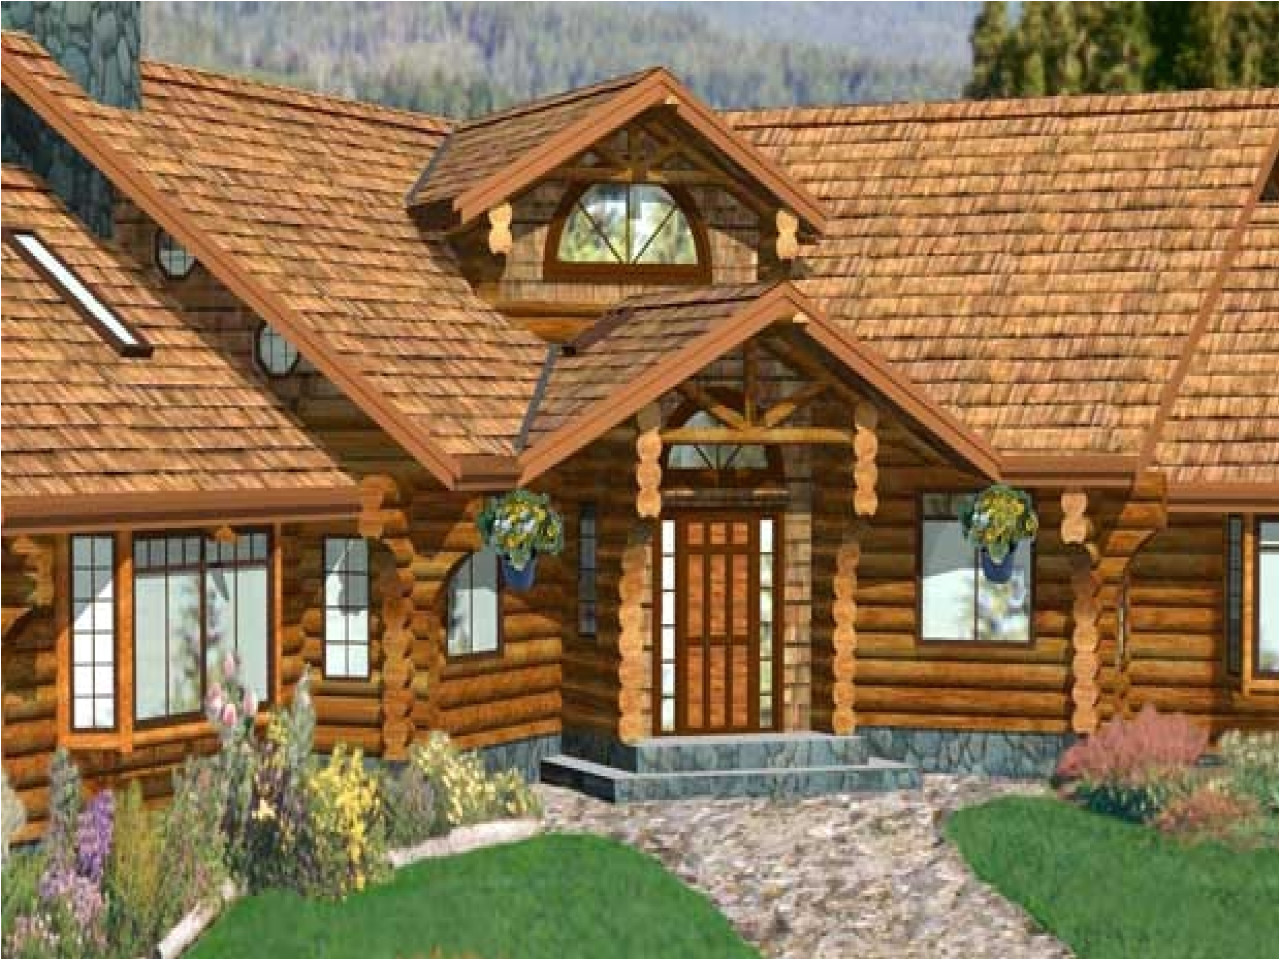 27afeb365a9d03d0 log cabin home plans designs log cabin house plans with open floor plan